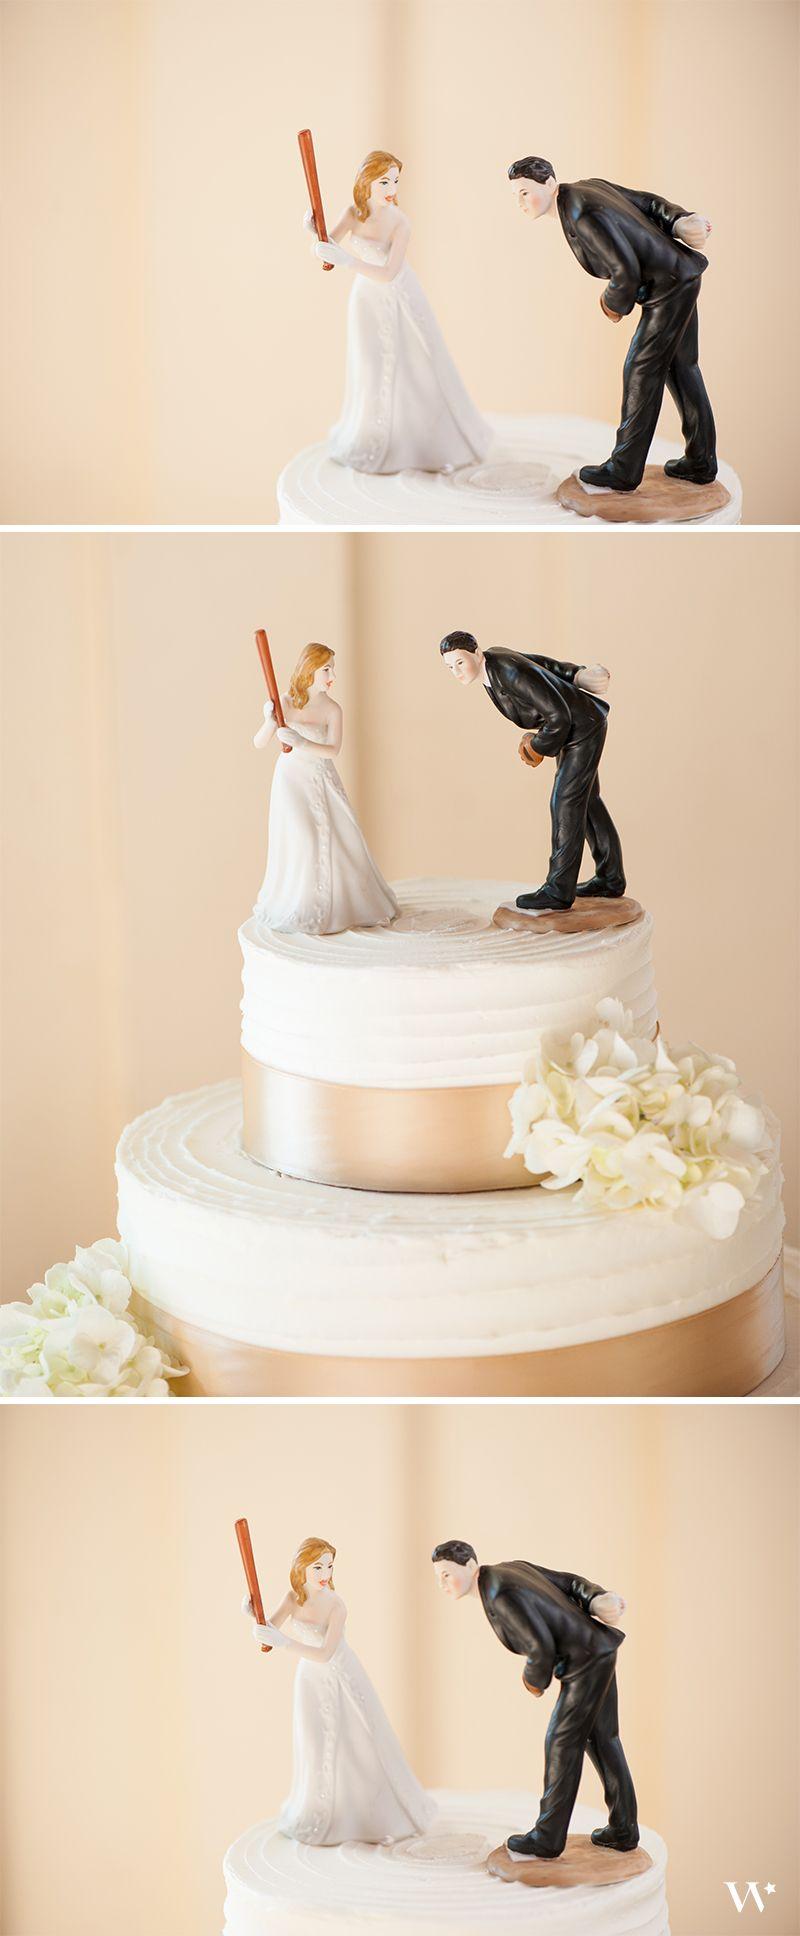 Baseball Wedding Cake Topper Wedding Cake Toppers Baseball Wedding Cakes Baseball Wedding Theme